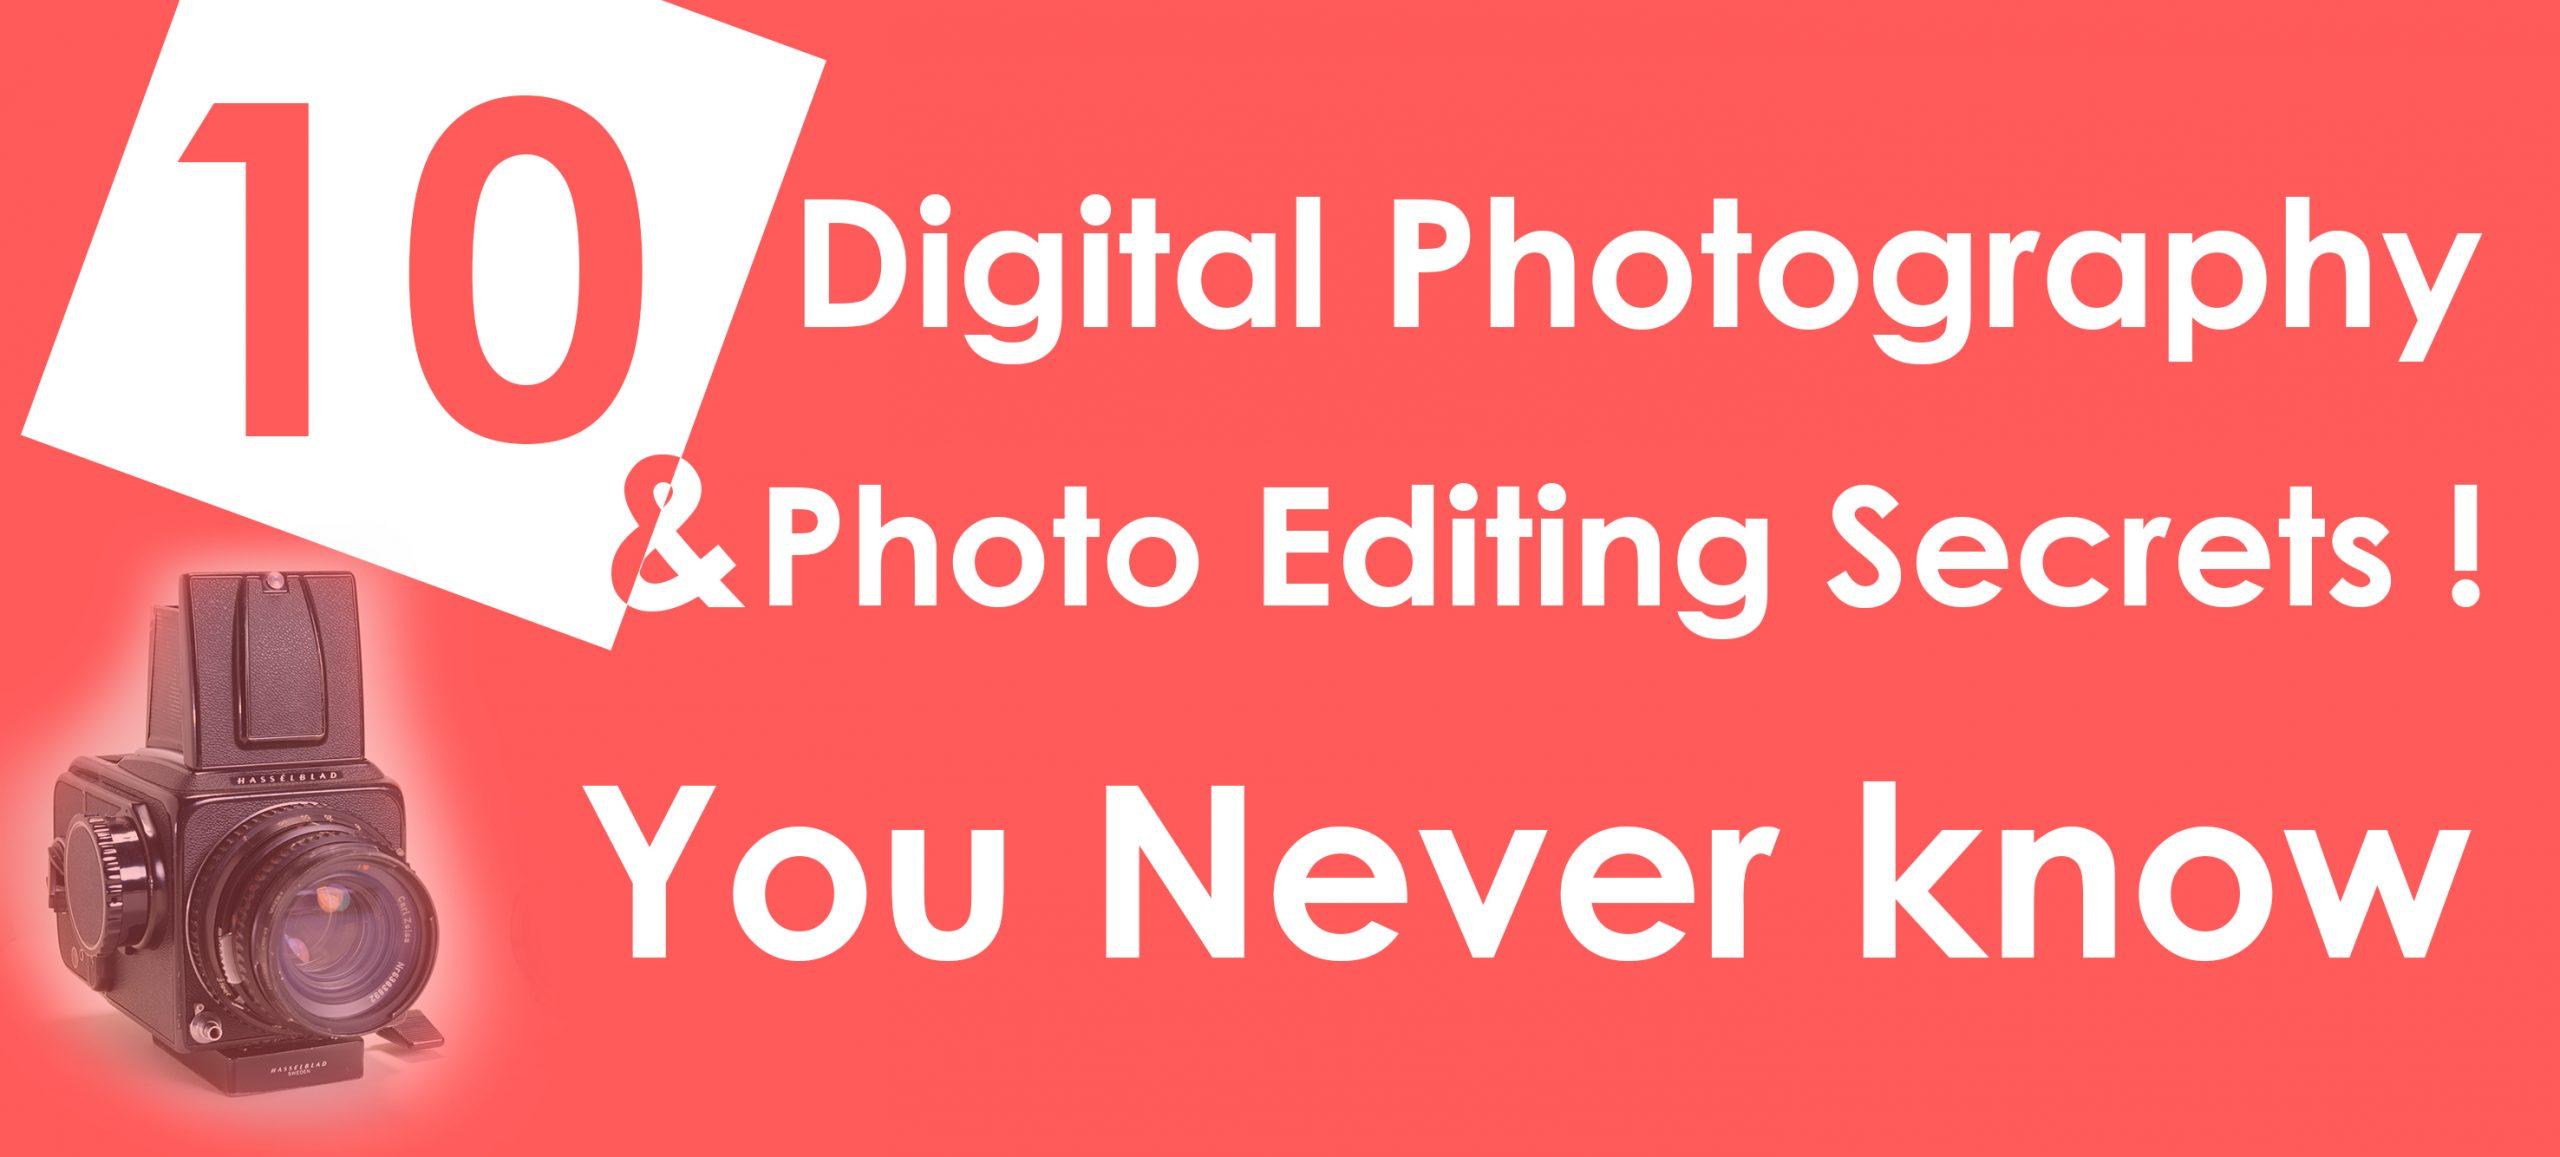 10 Digital Photography